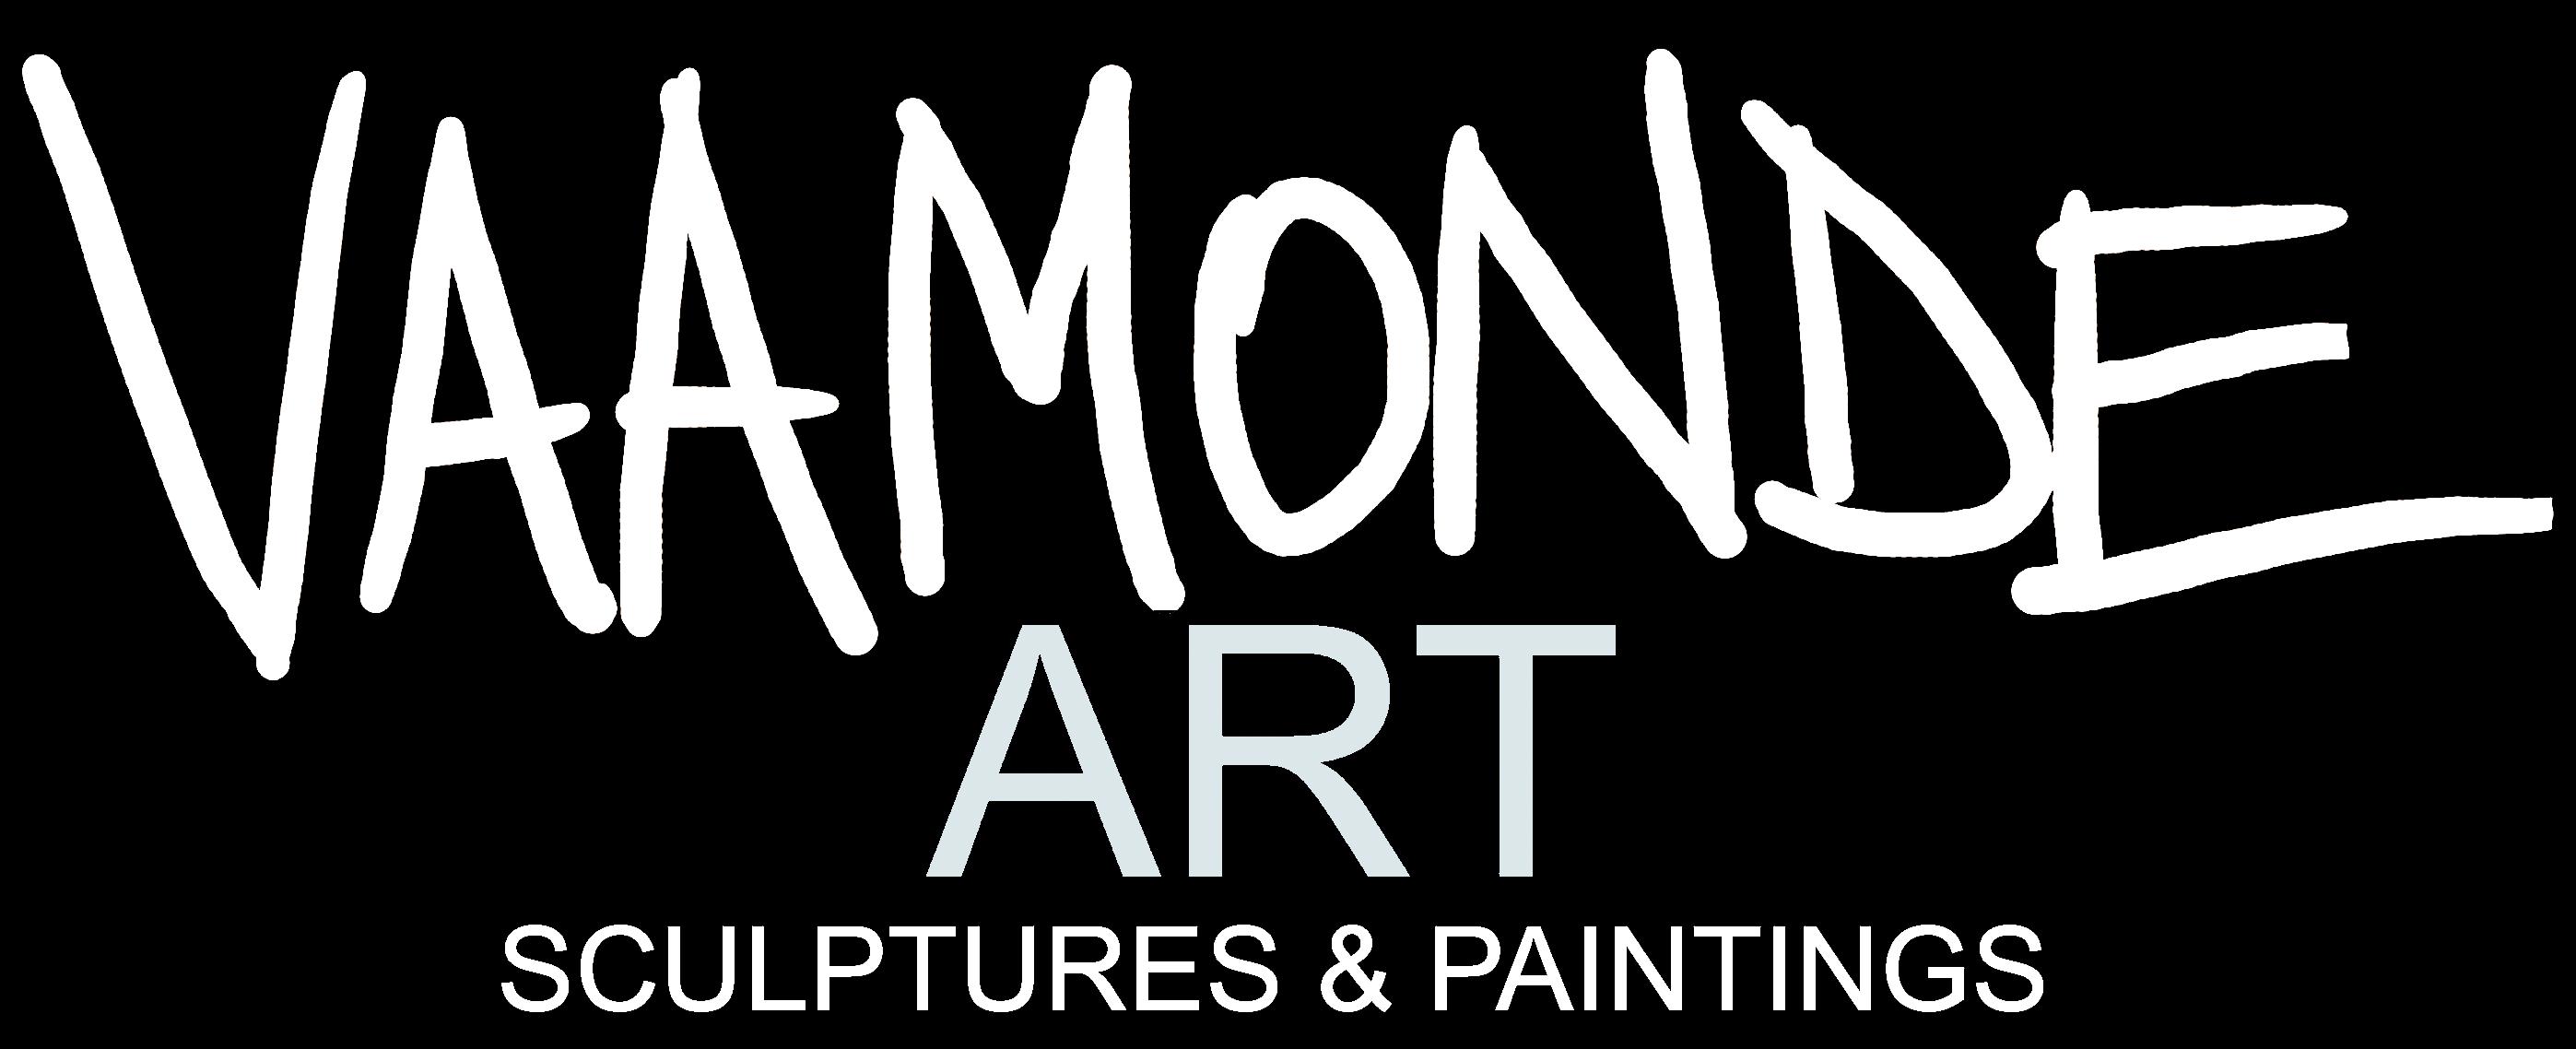 Vaamonde ART